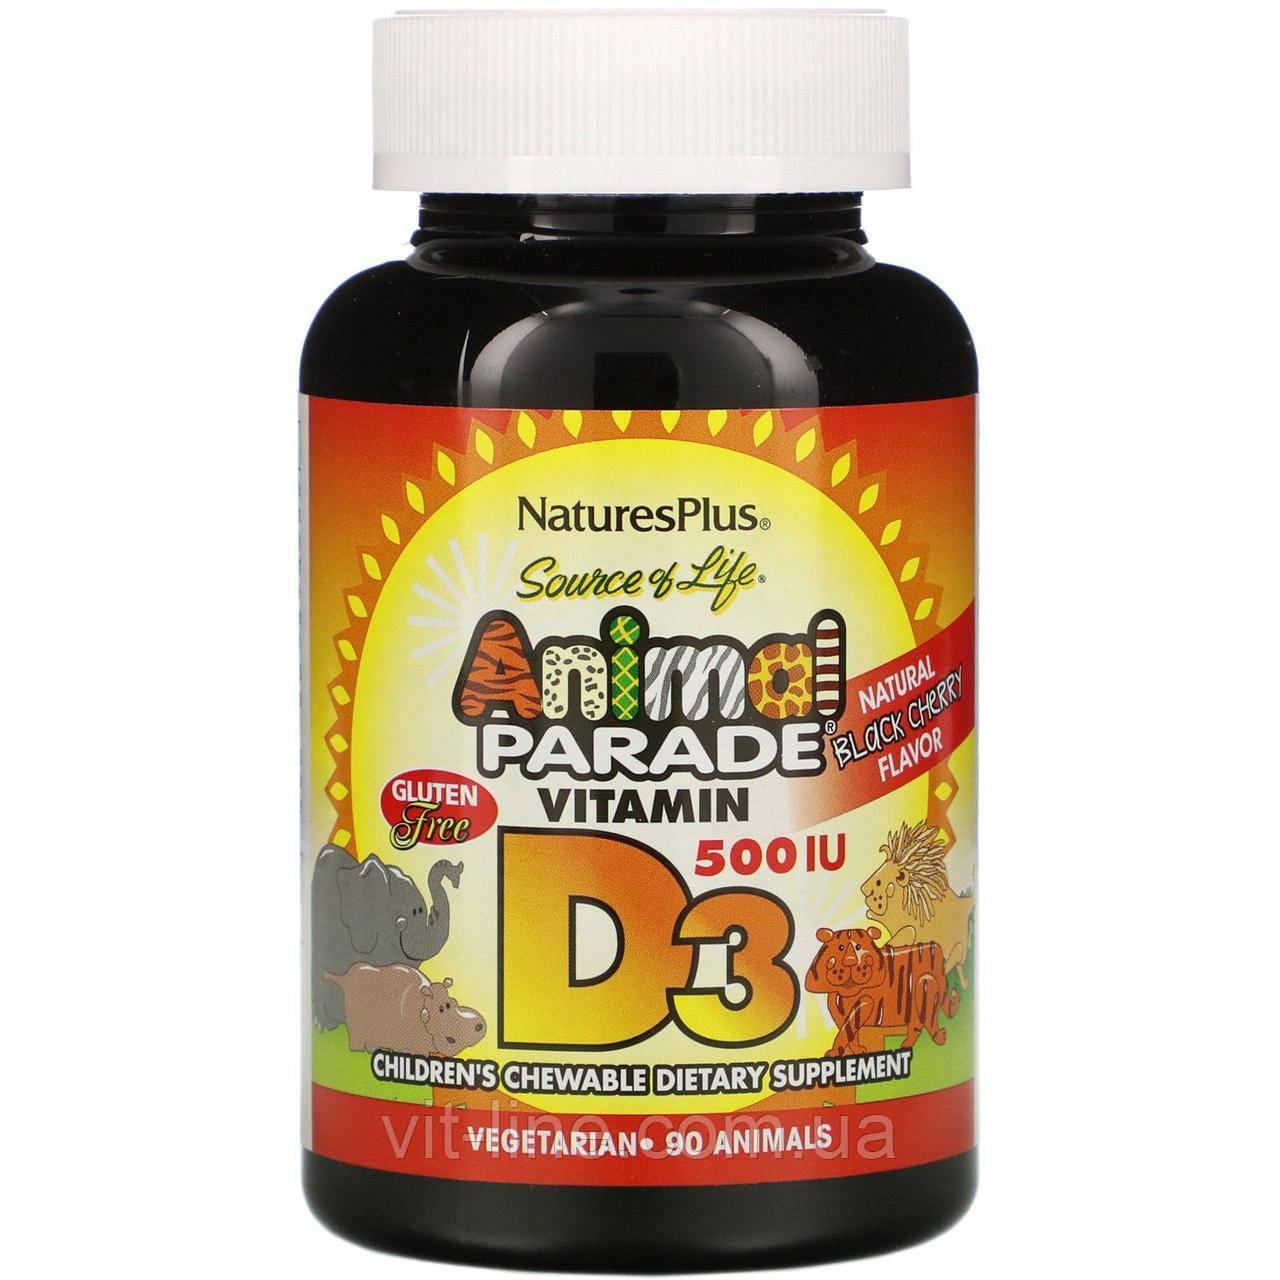 Nature's Plus, Source of Life, Animal Parade, витамин D3 вкус черешни 500 МЕ, 90 животных